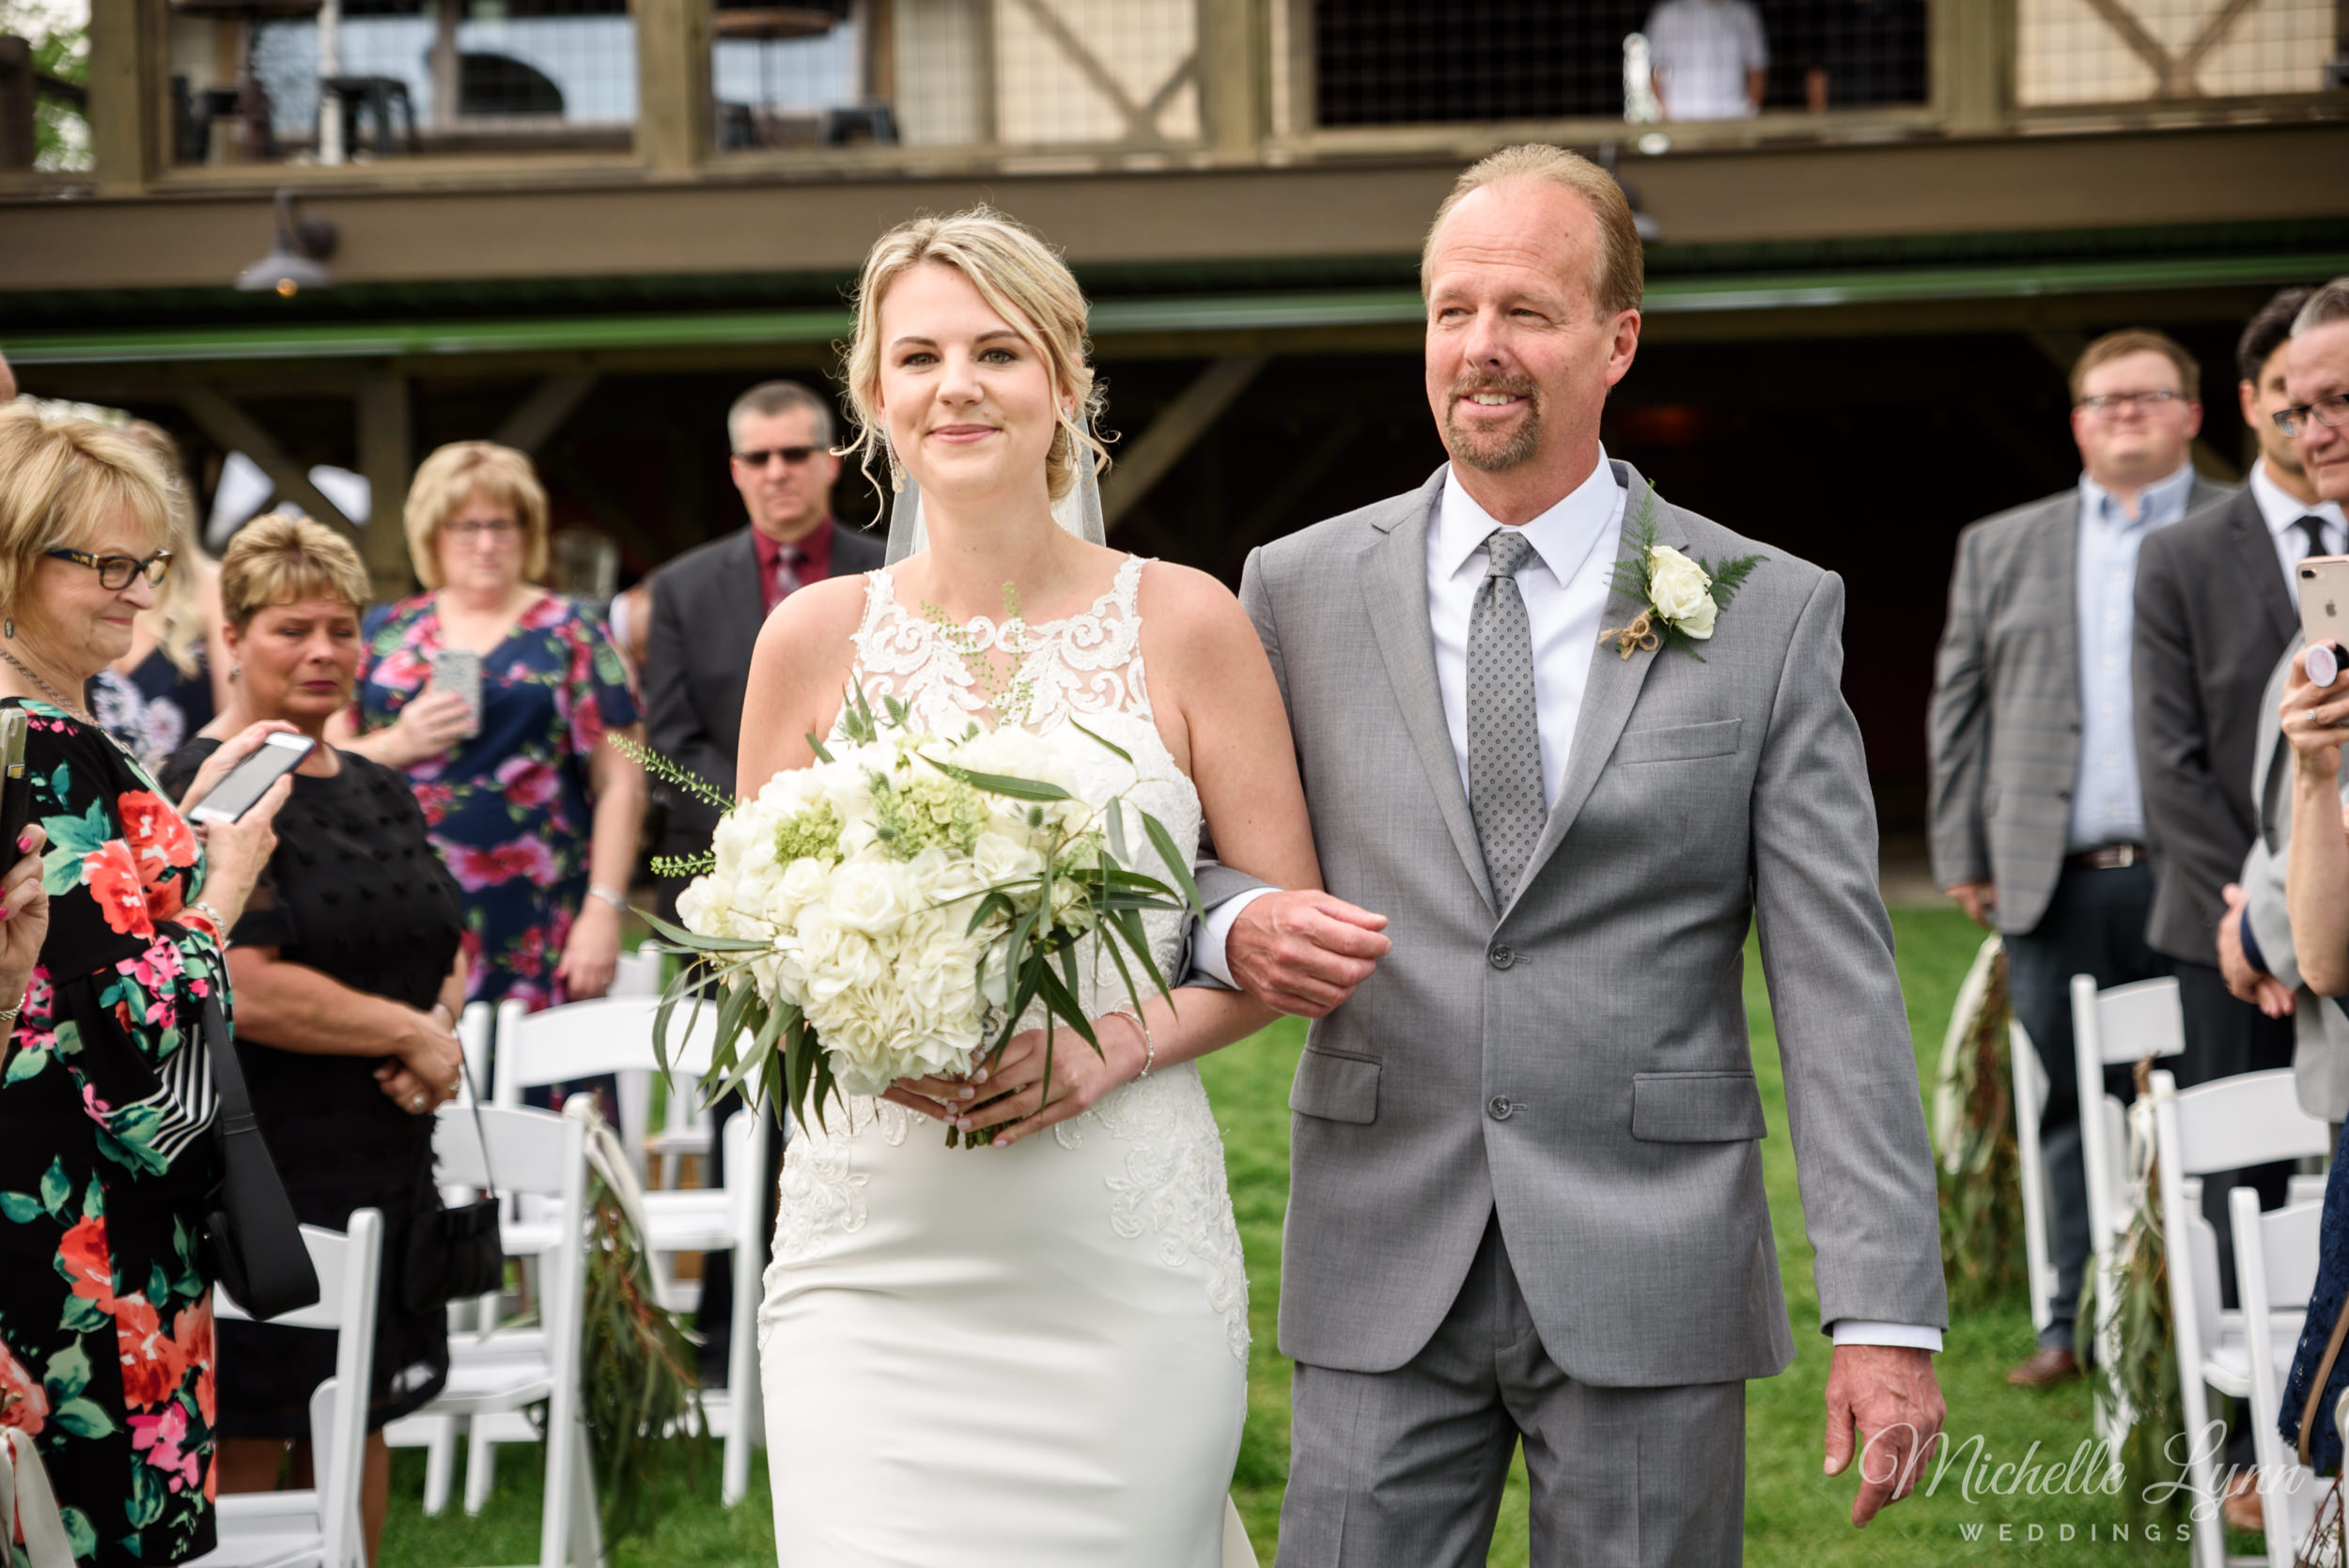 mlw-the-farm-bakery-and-events-wedding-photos-32.jpg